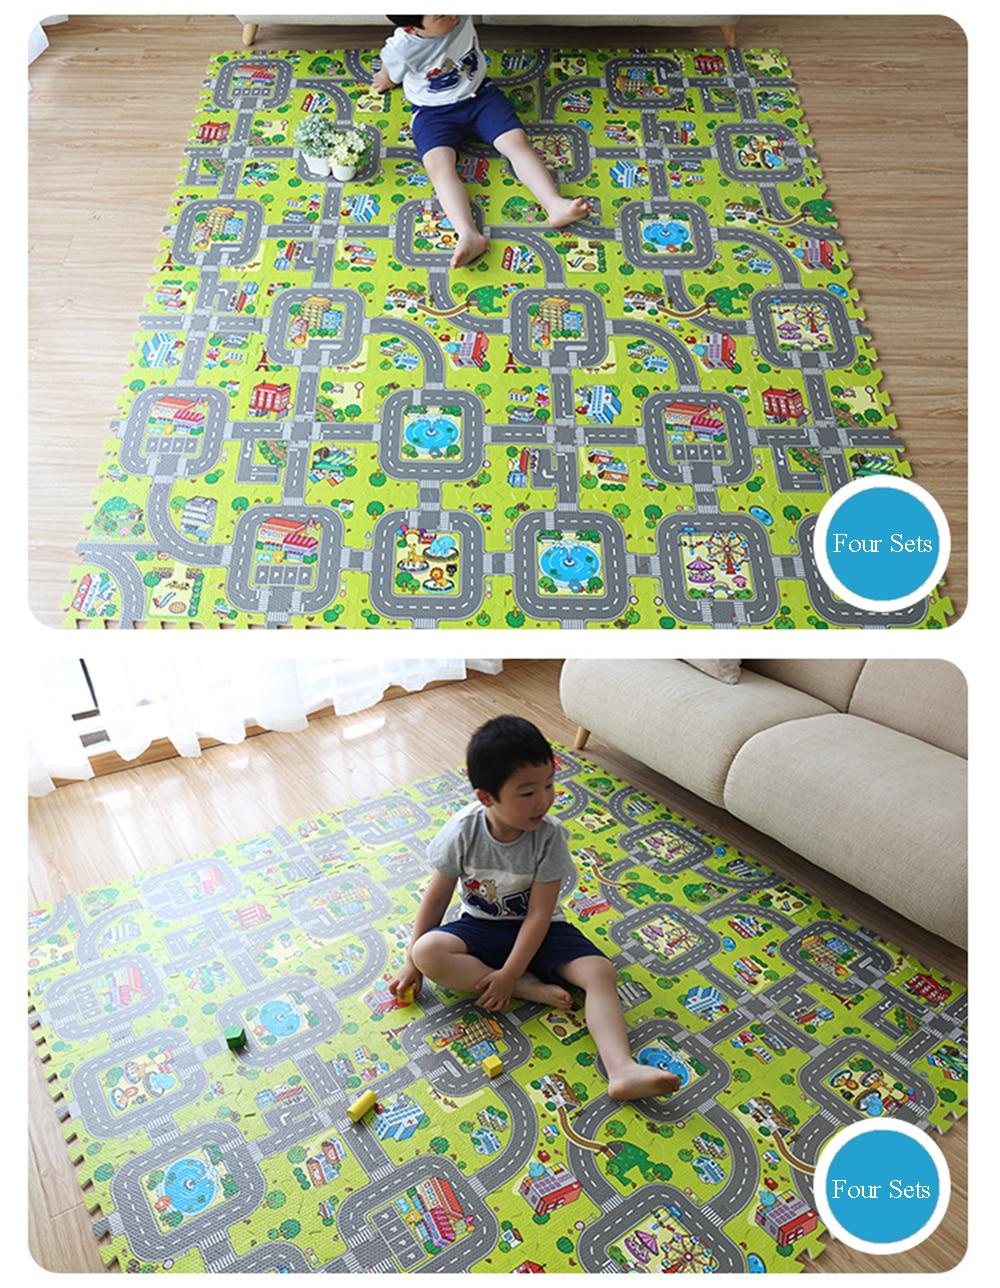 Baby EVA Foam Puzzle Play Floor Mat City Road Education Carpets Interlocking Tiles Kids Traffic Route Ground Pad (No Edge) NEEU